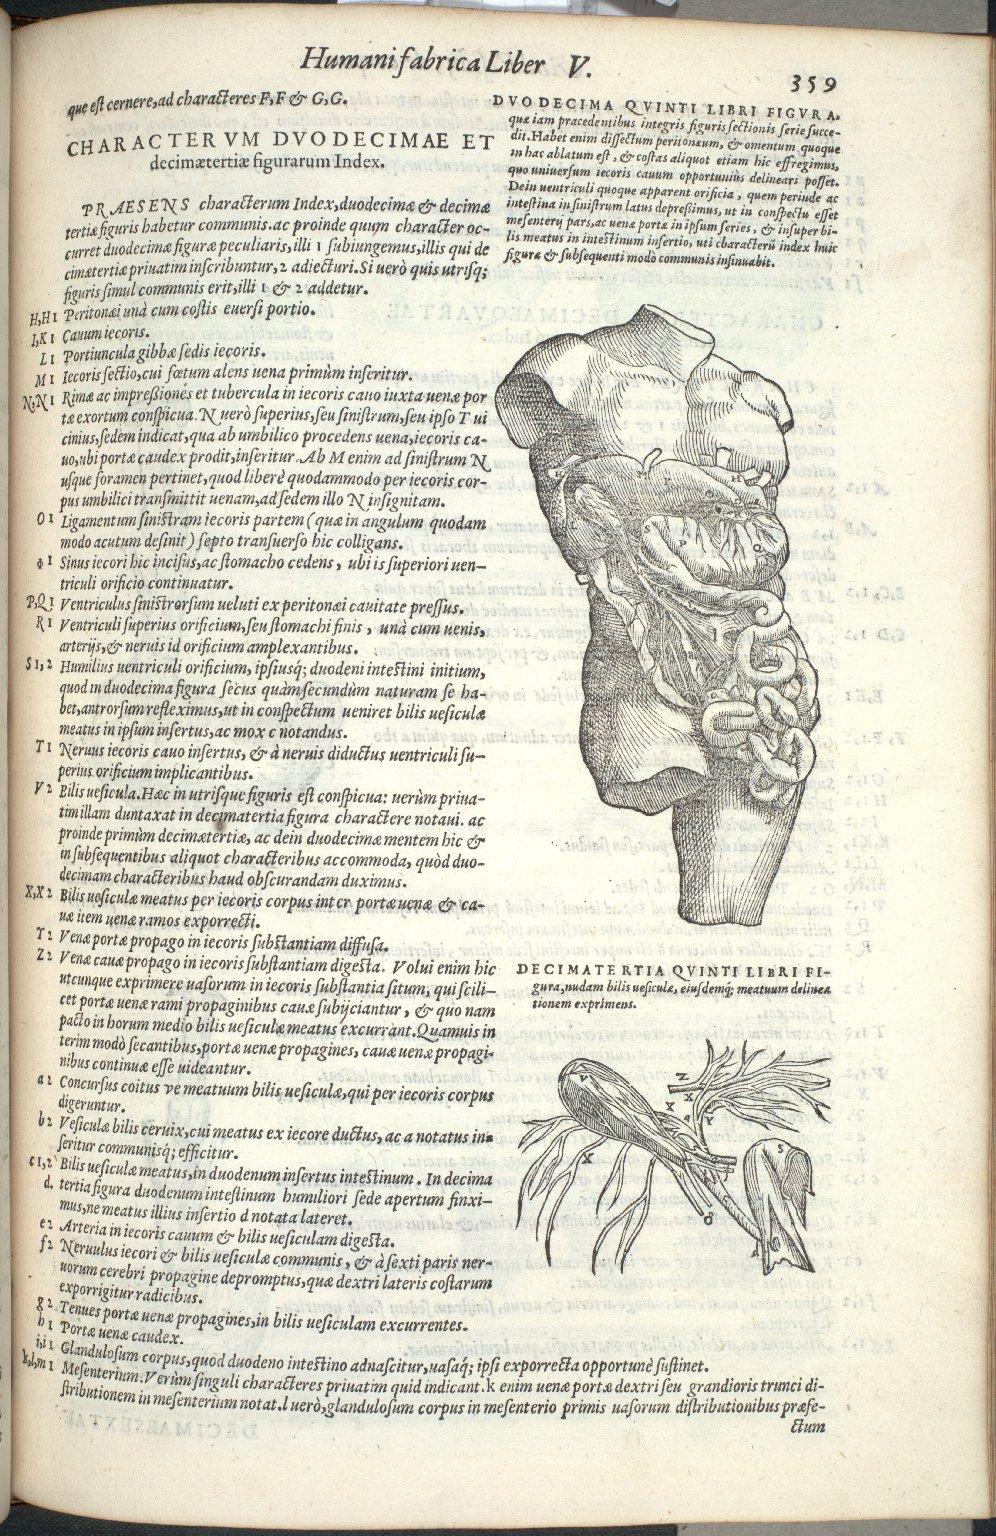 Duodecima Quinti Libri Figura, Decimatertia Quinti Libri Figura